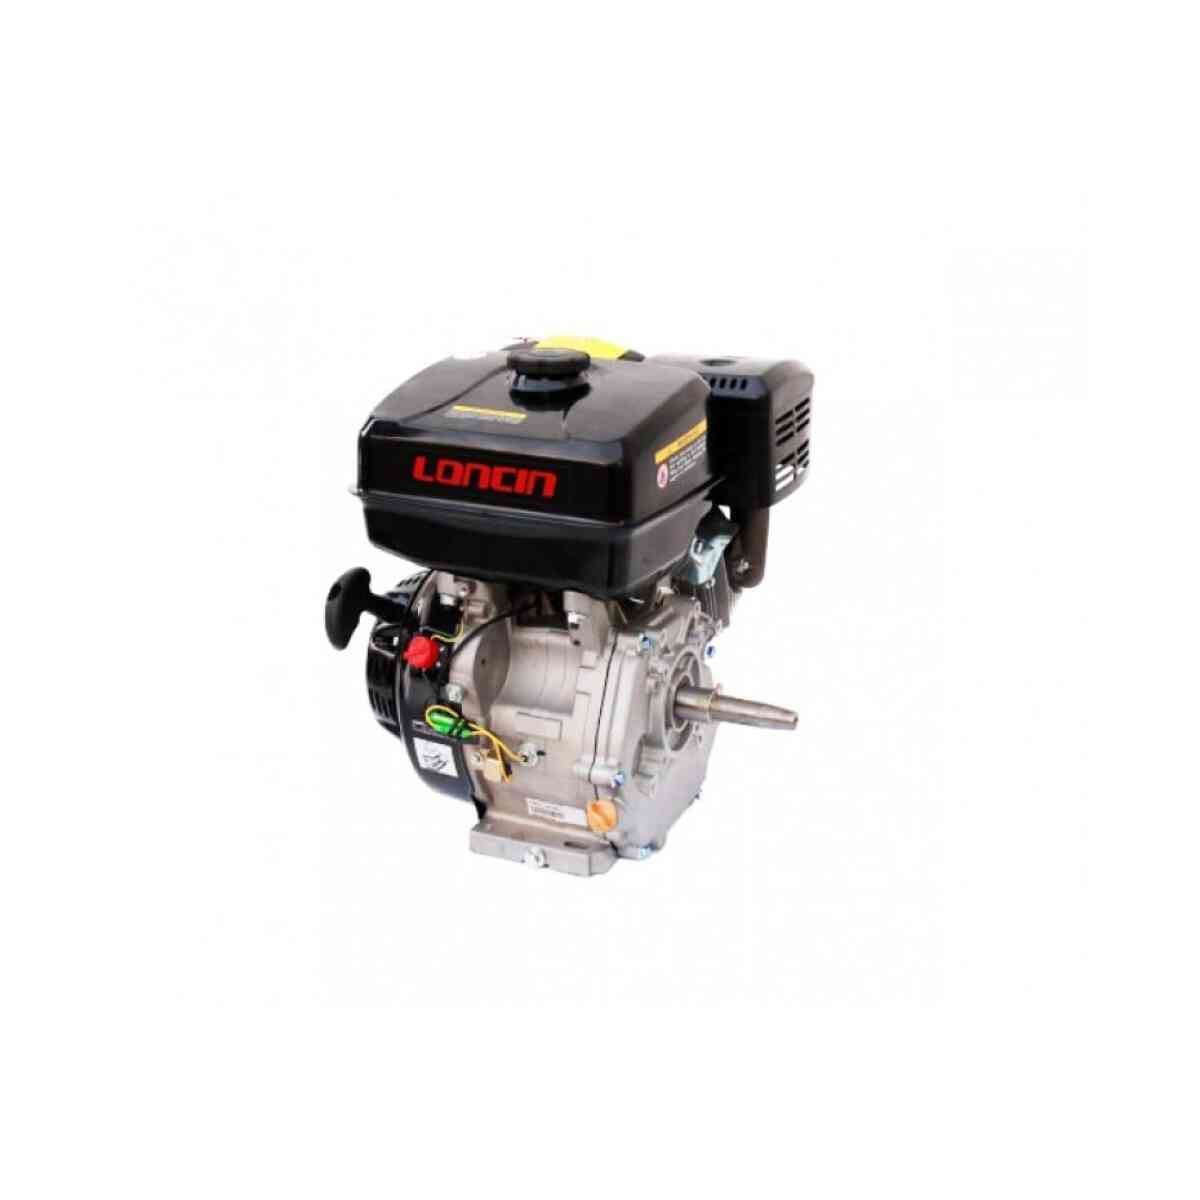 motor loncin 9cp ax conic g270f g padure gardina.ro 29